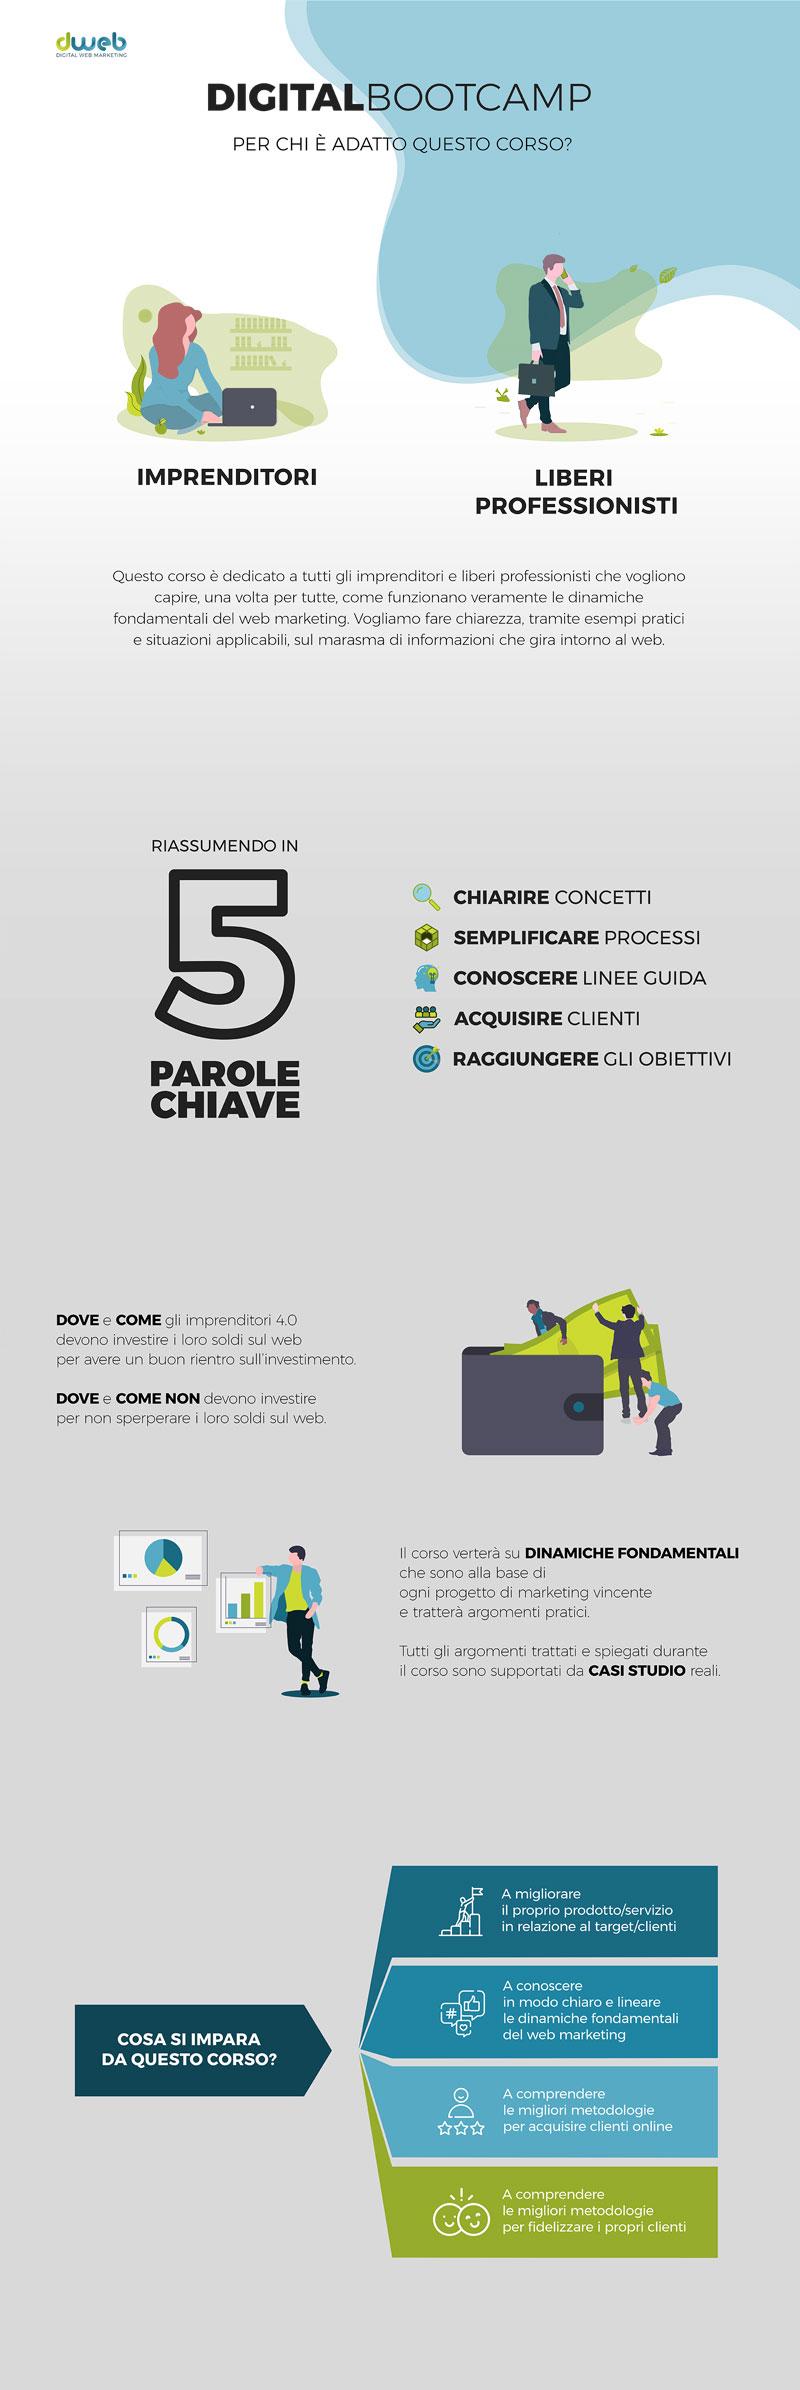 infografica digital bootcamp